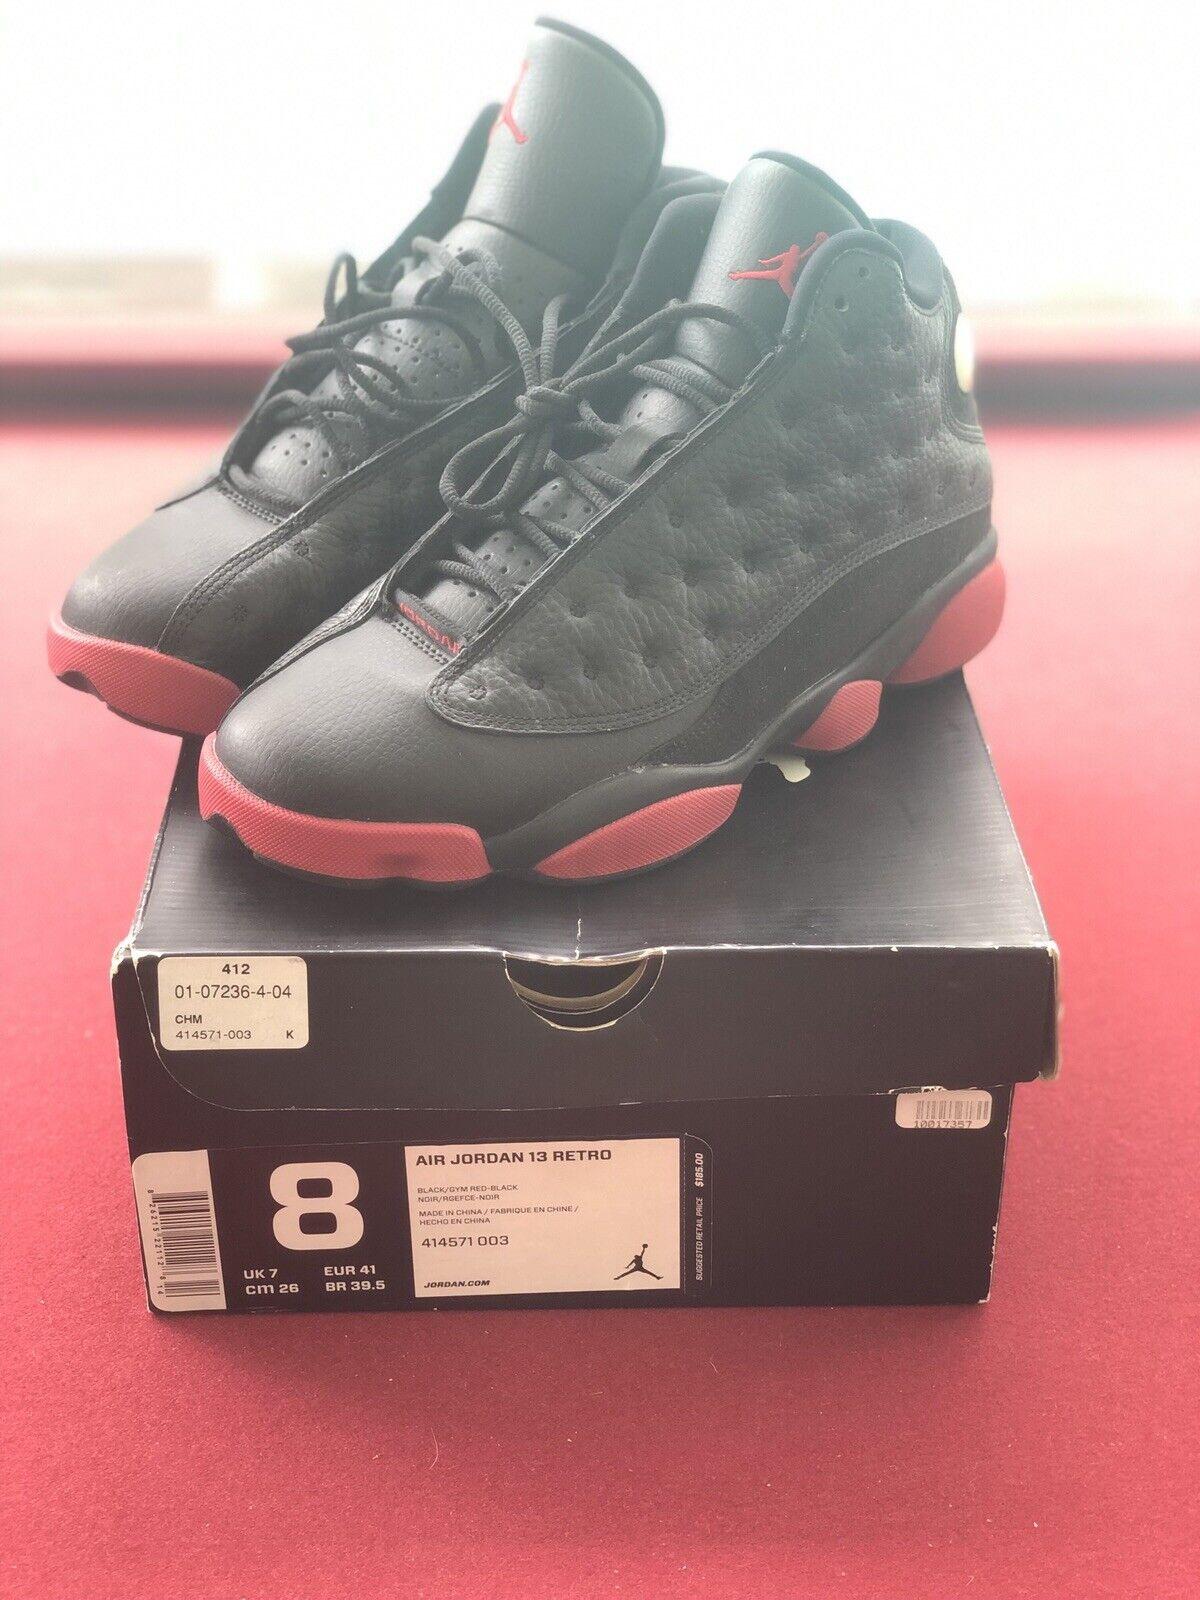 Jordan 13 Retro XIII 'Air raza sucia  Rojo Negro Cat playoffs 414571-003